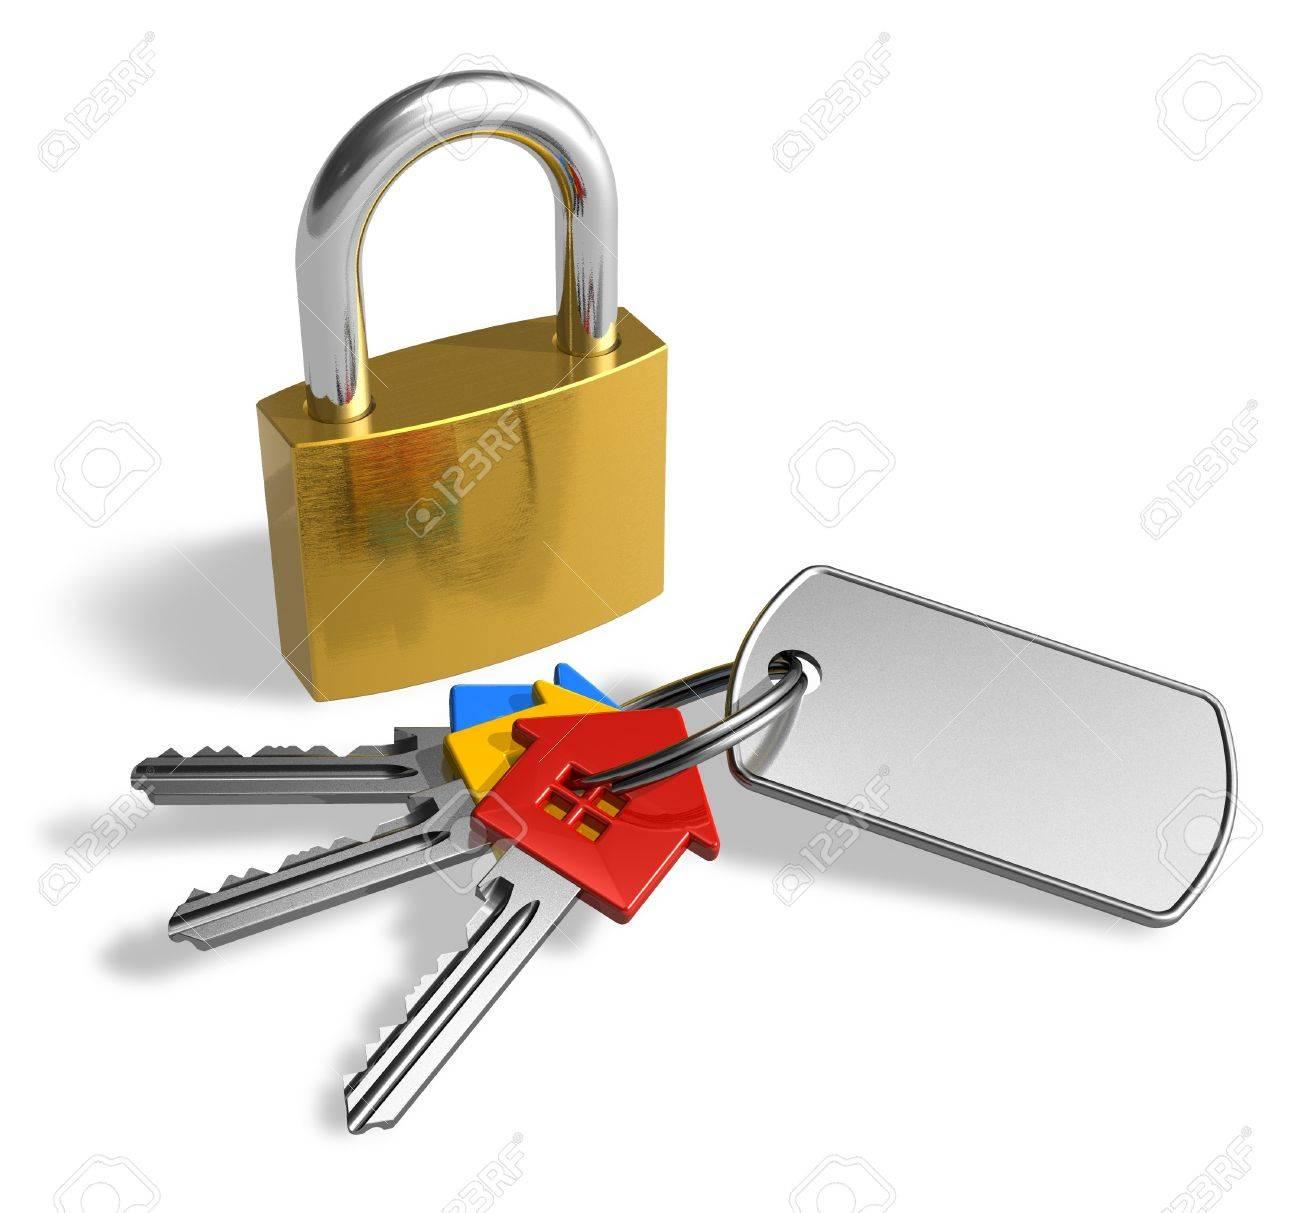 Padlock with bunch of keys - 7930037